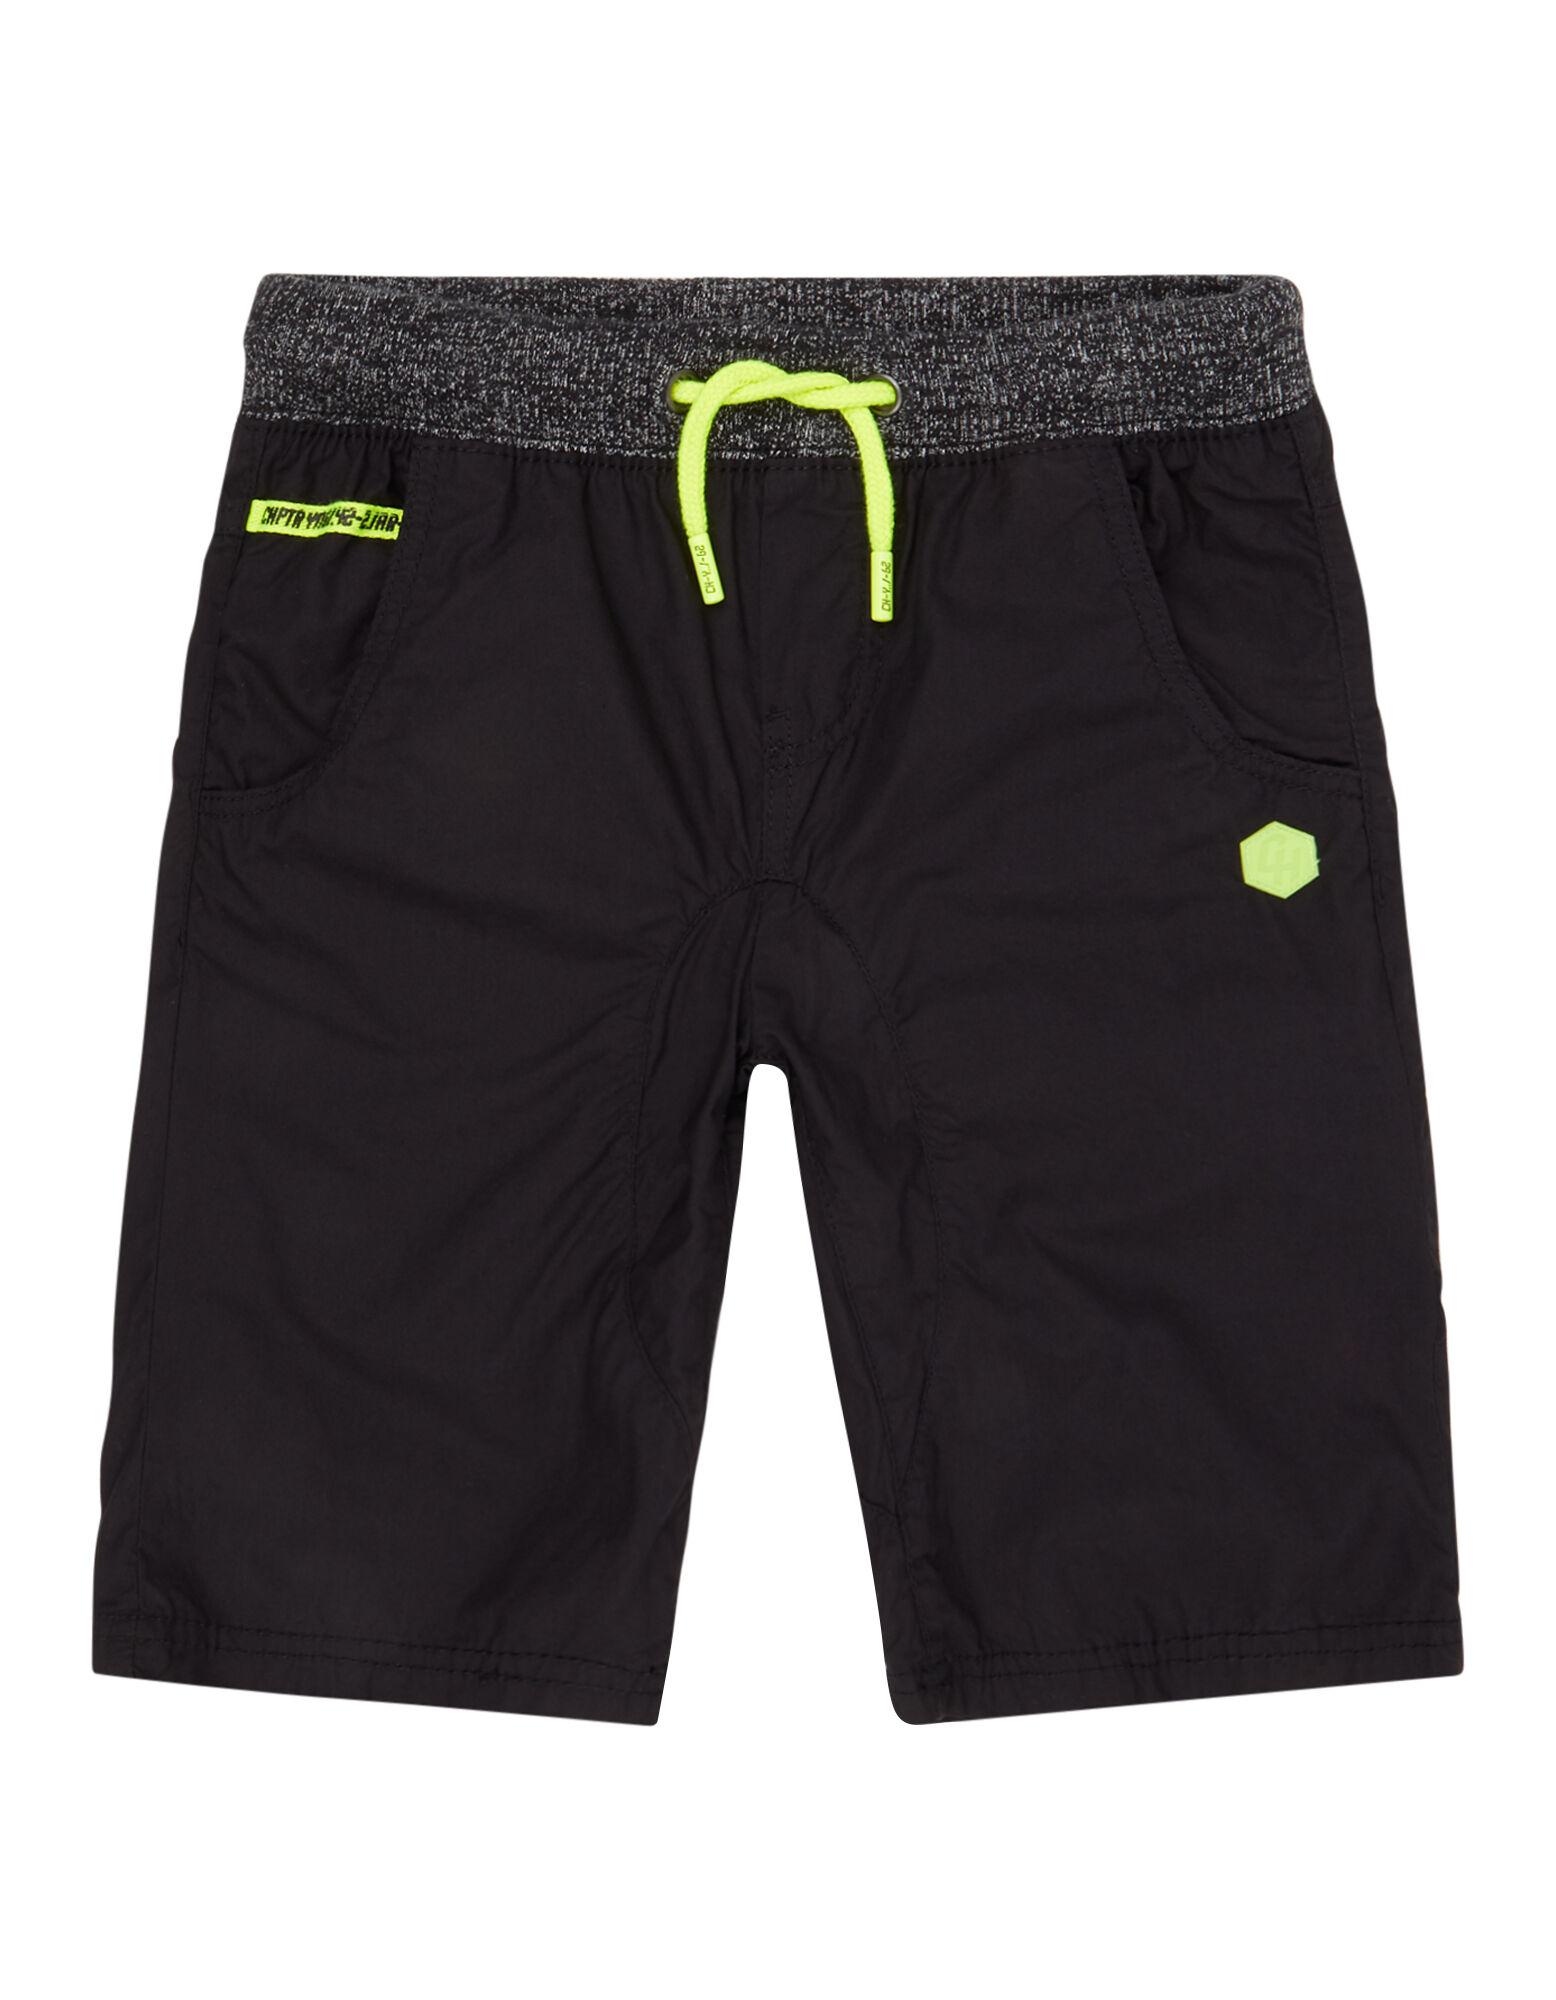 Kleidung & Accessoires Kinder Jungen Hose Bermuda Jeans Kurze Hosen Größe 98 Mit Gürtel Kindermode, Schuhe & Access.